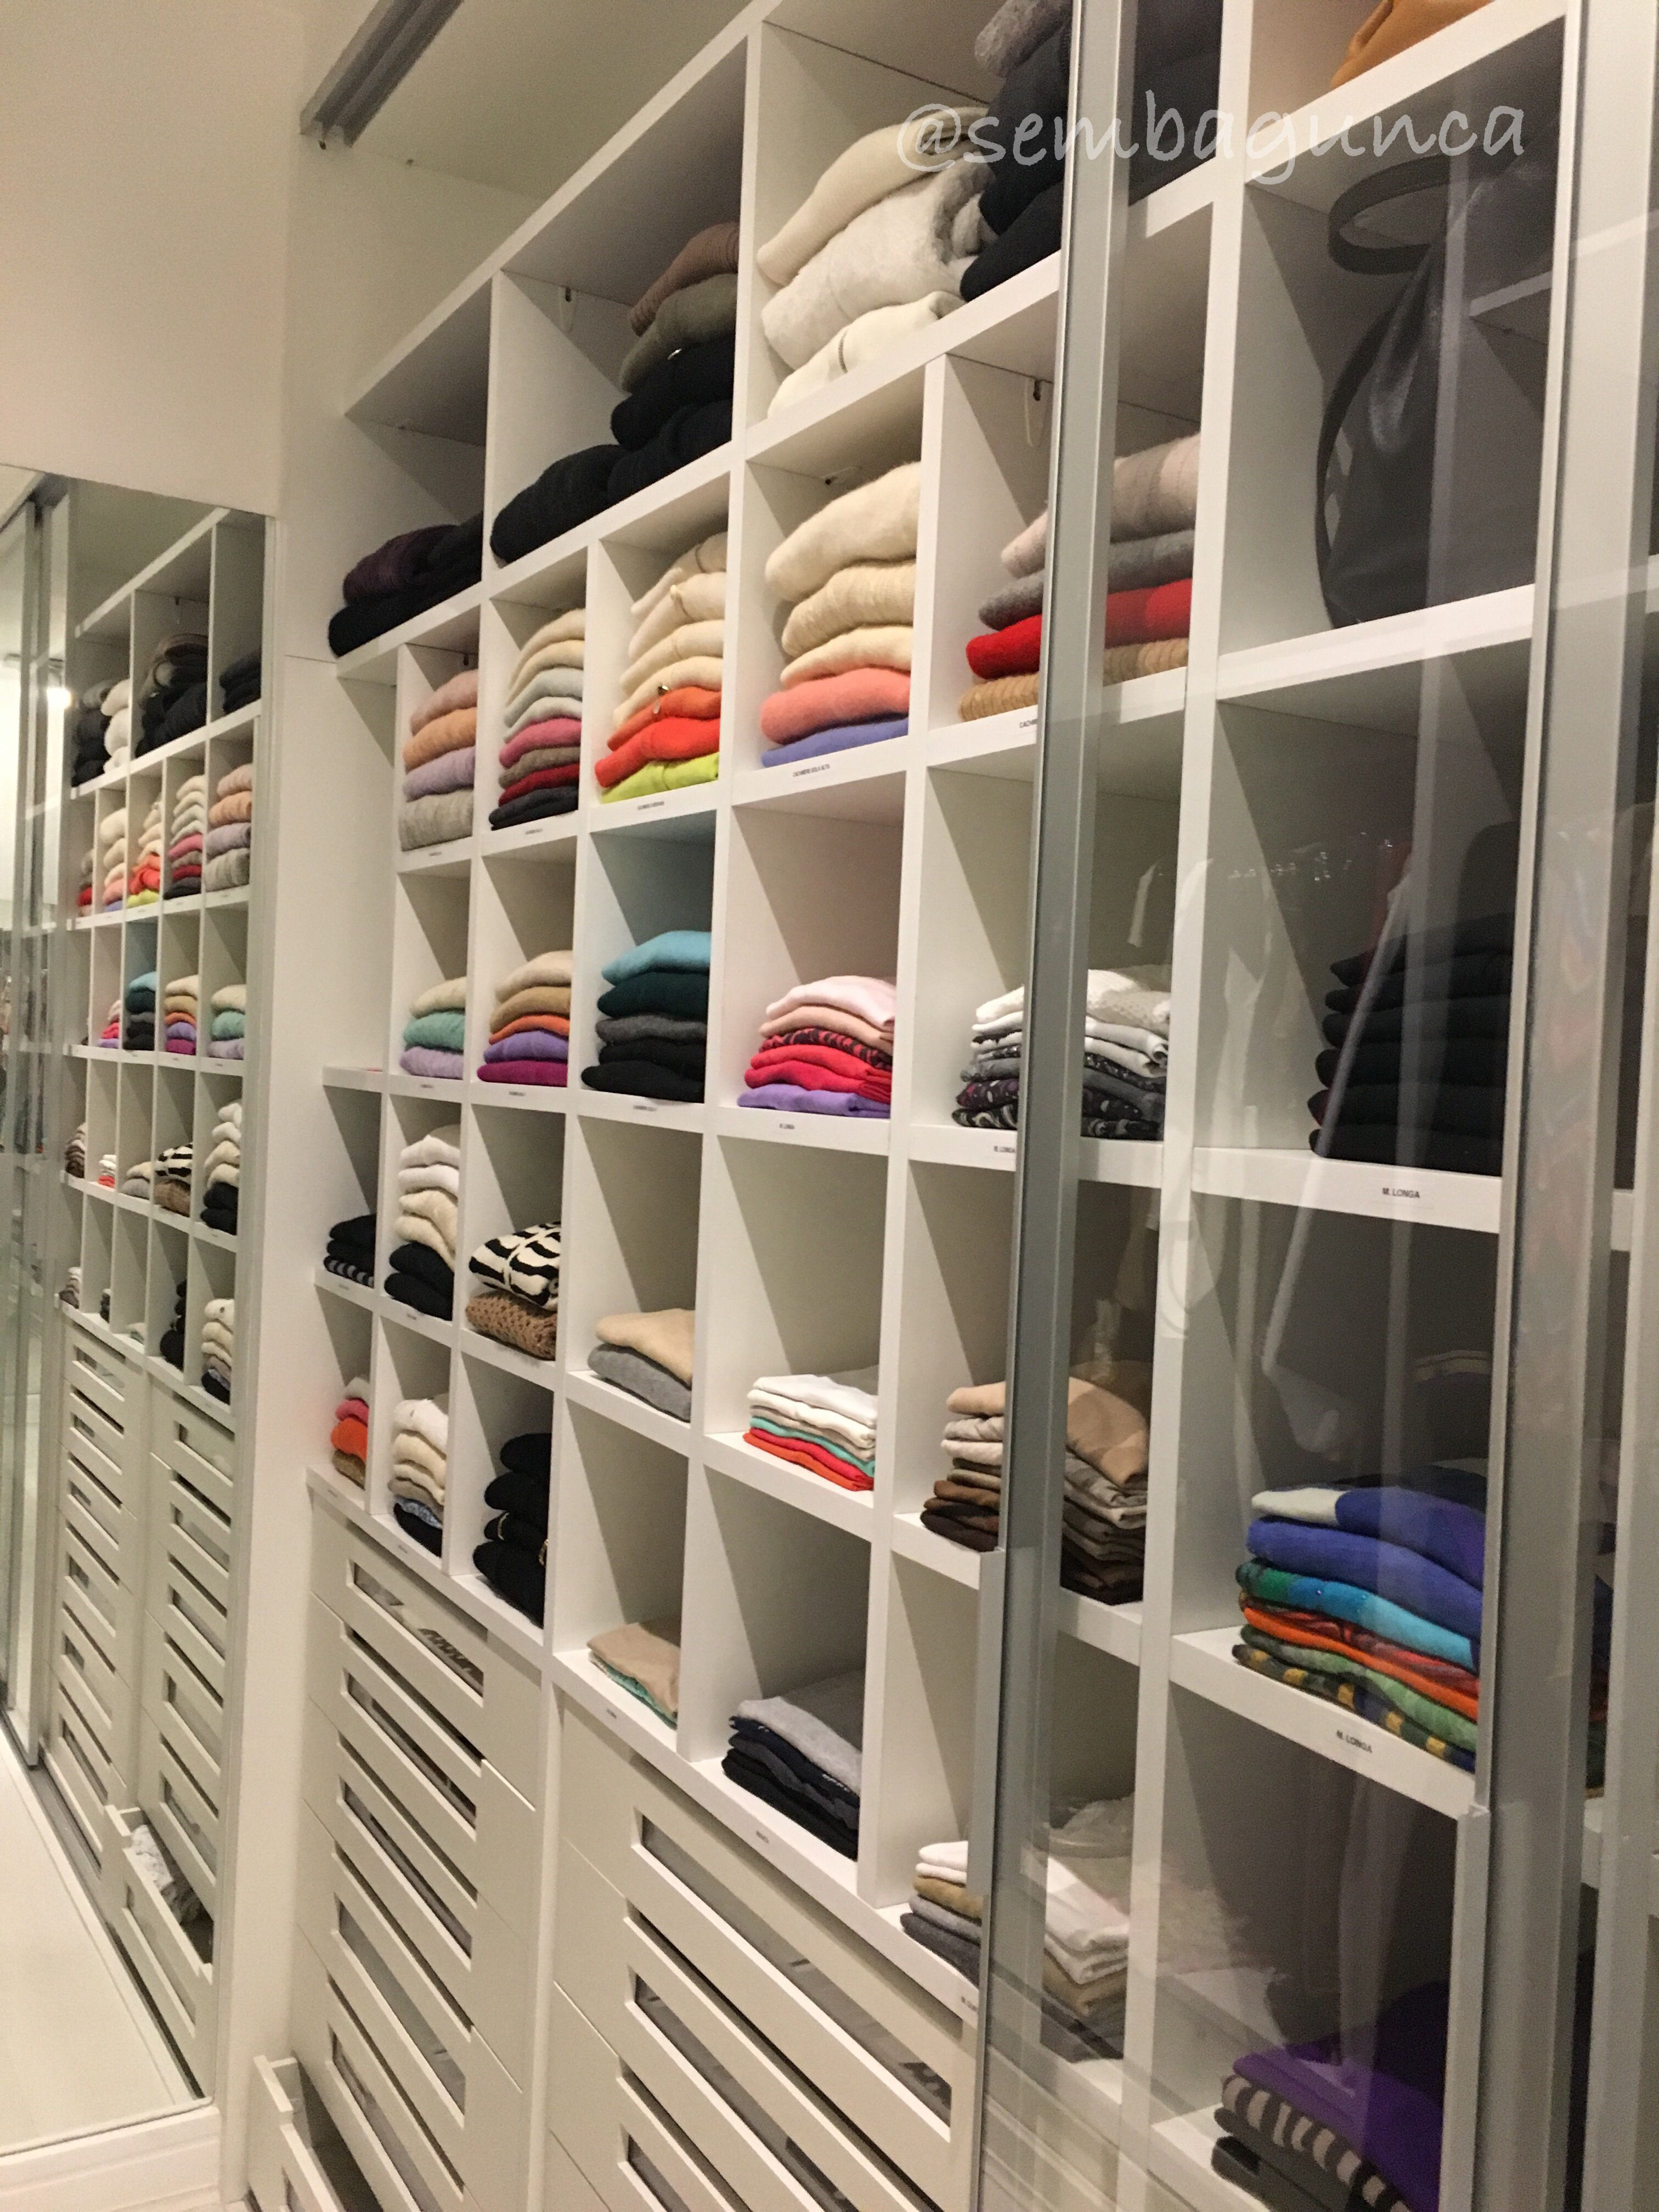 Personal Closet Organizer organizedsem bagunça, personal organizer > instagram